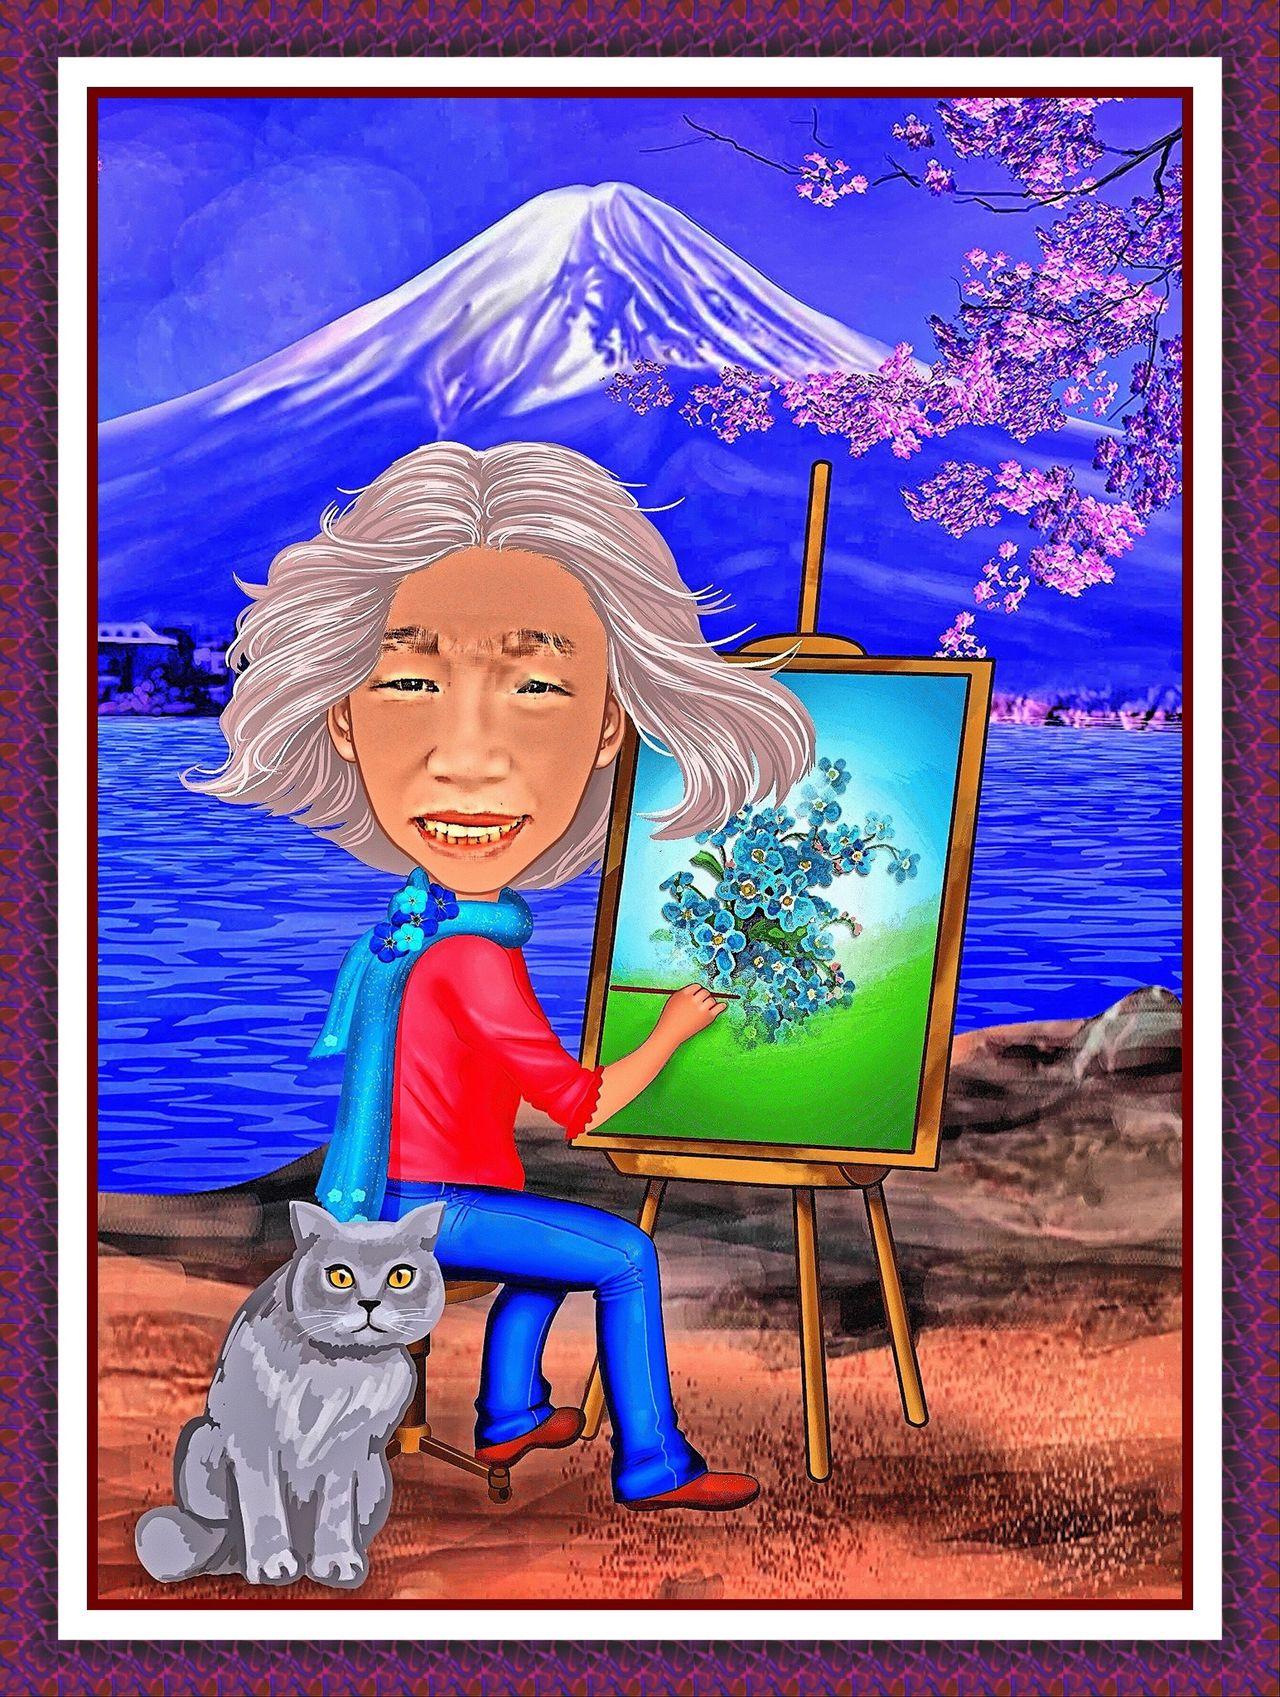 Frame Maker Pro CariCartoon (app) Japan Mt. Fuji lake Outdoors spring Cherry Blossoms artist Painter cat Yoko Painting grandma Family cartoon Caricature